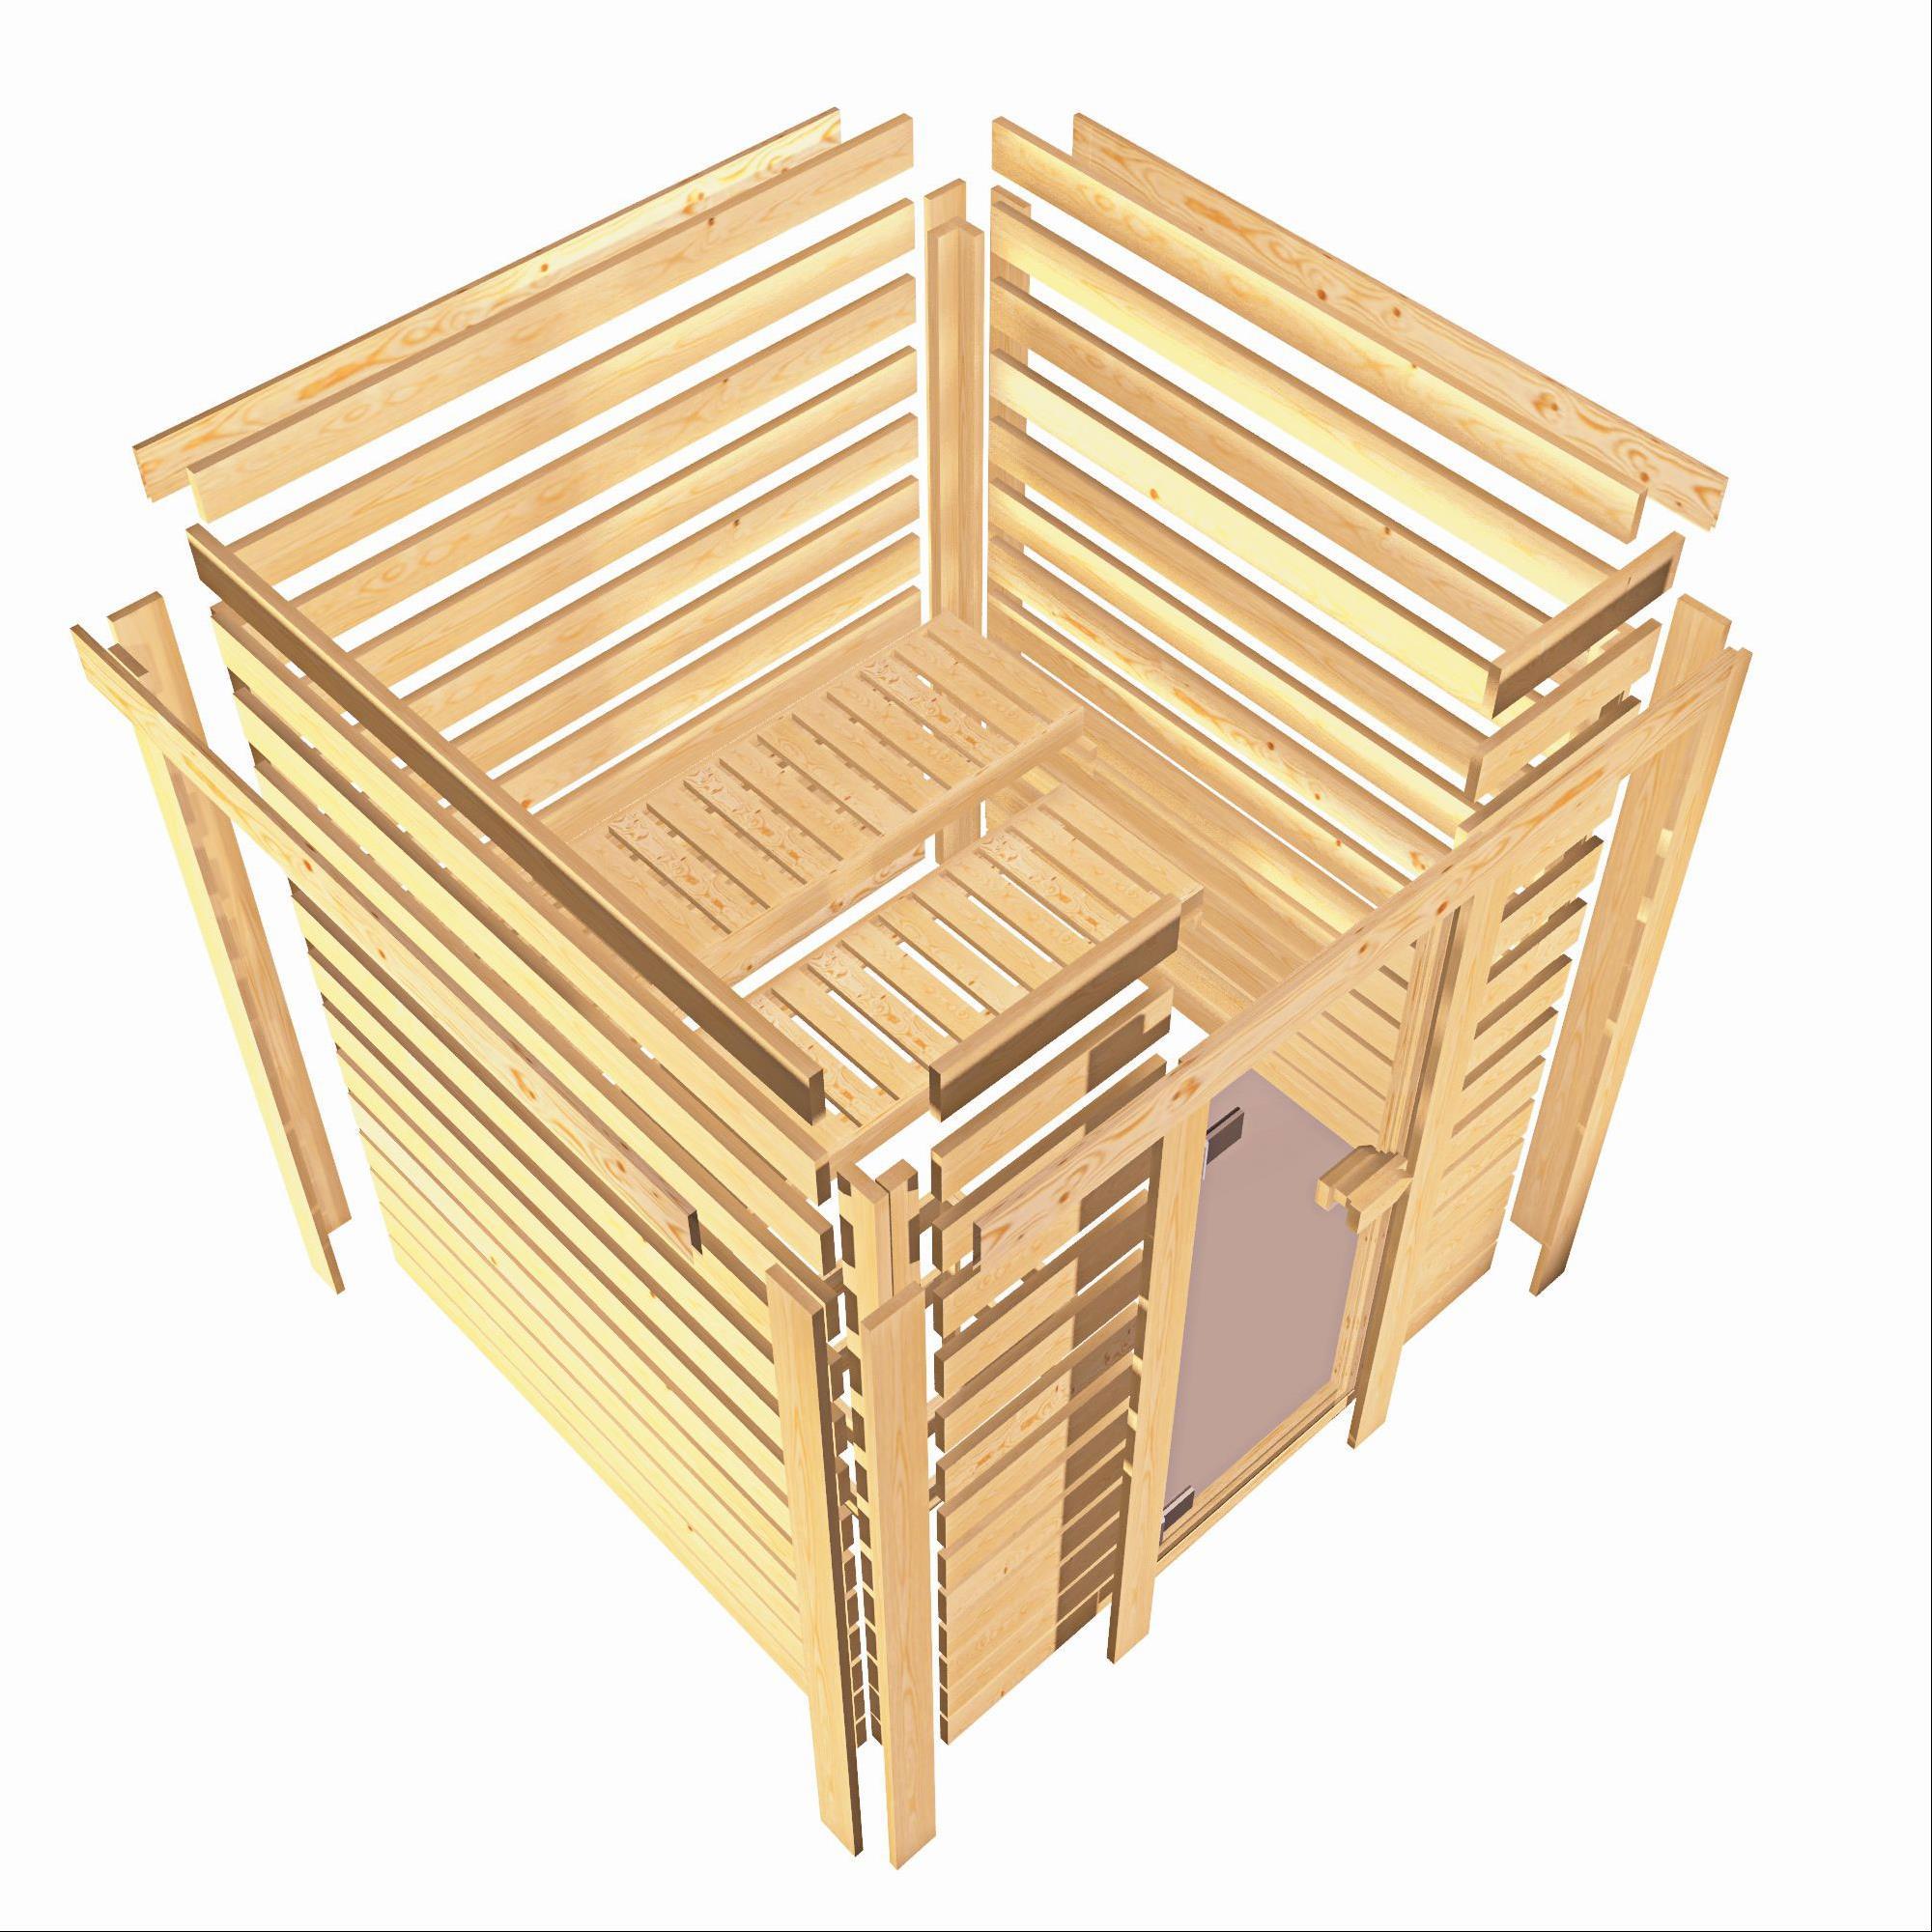 WoodFeeling Sauna Svea 38mm mit Bio Saunaofen 9 kW extern Holztür Bild 4